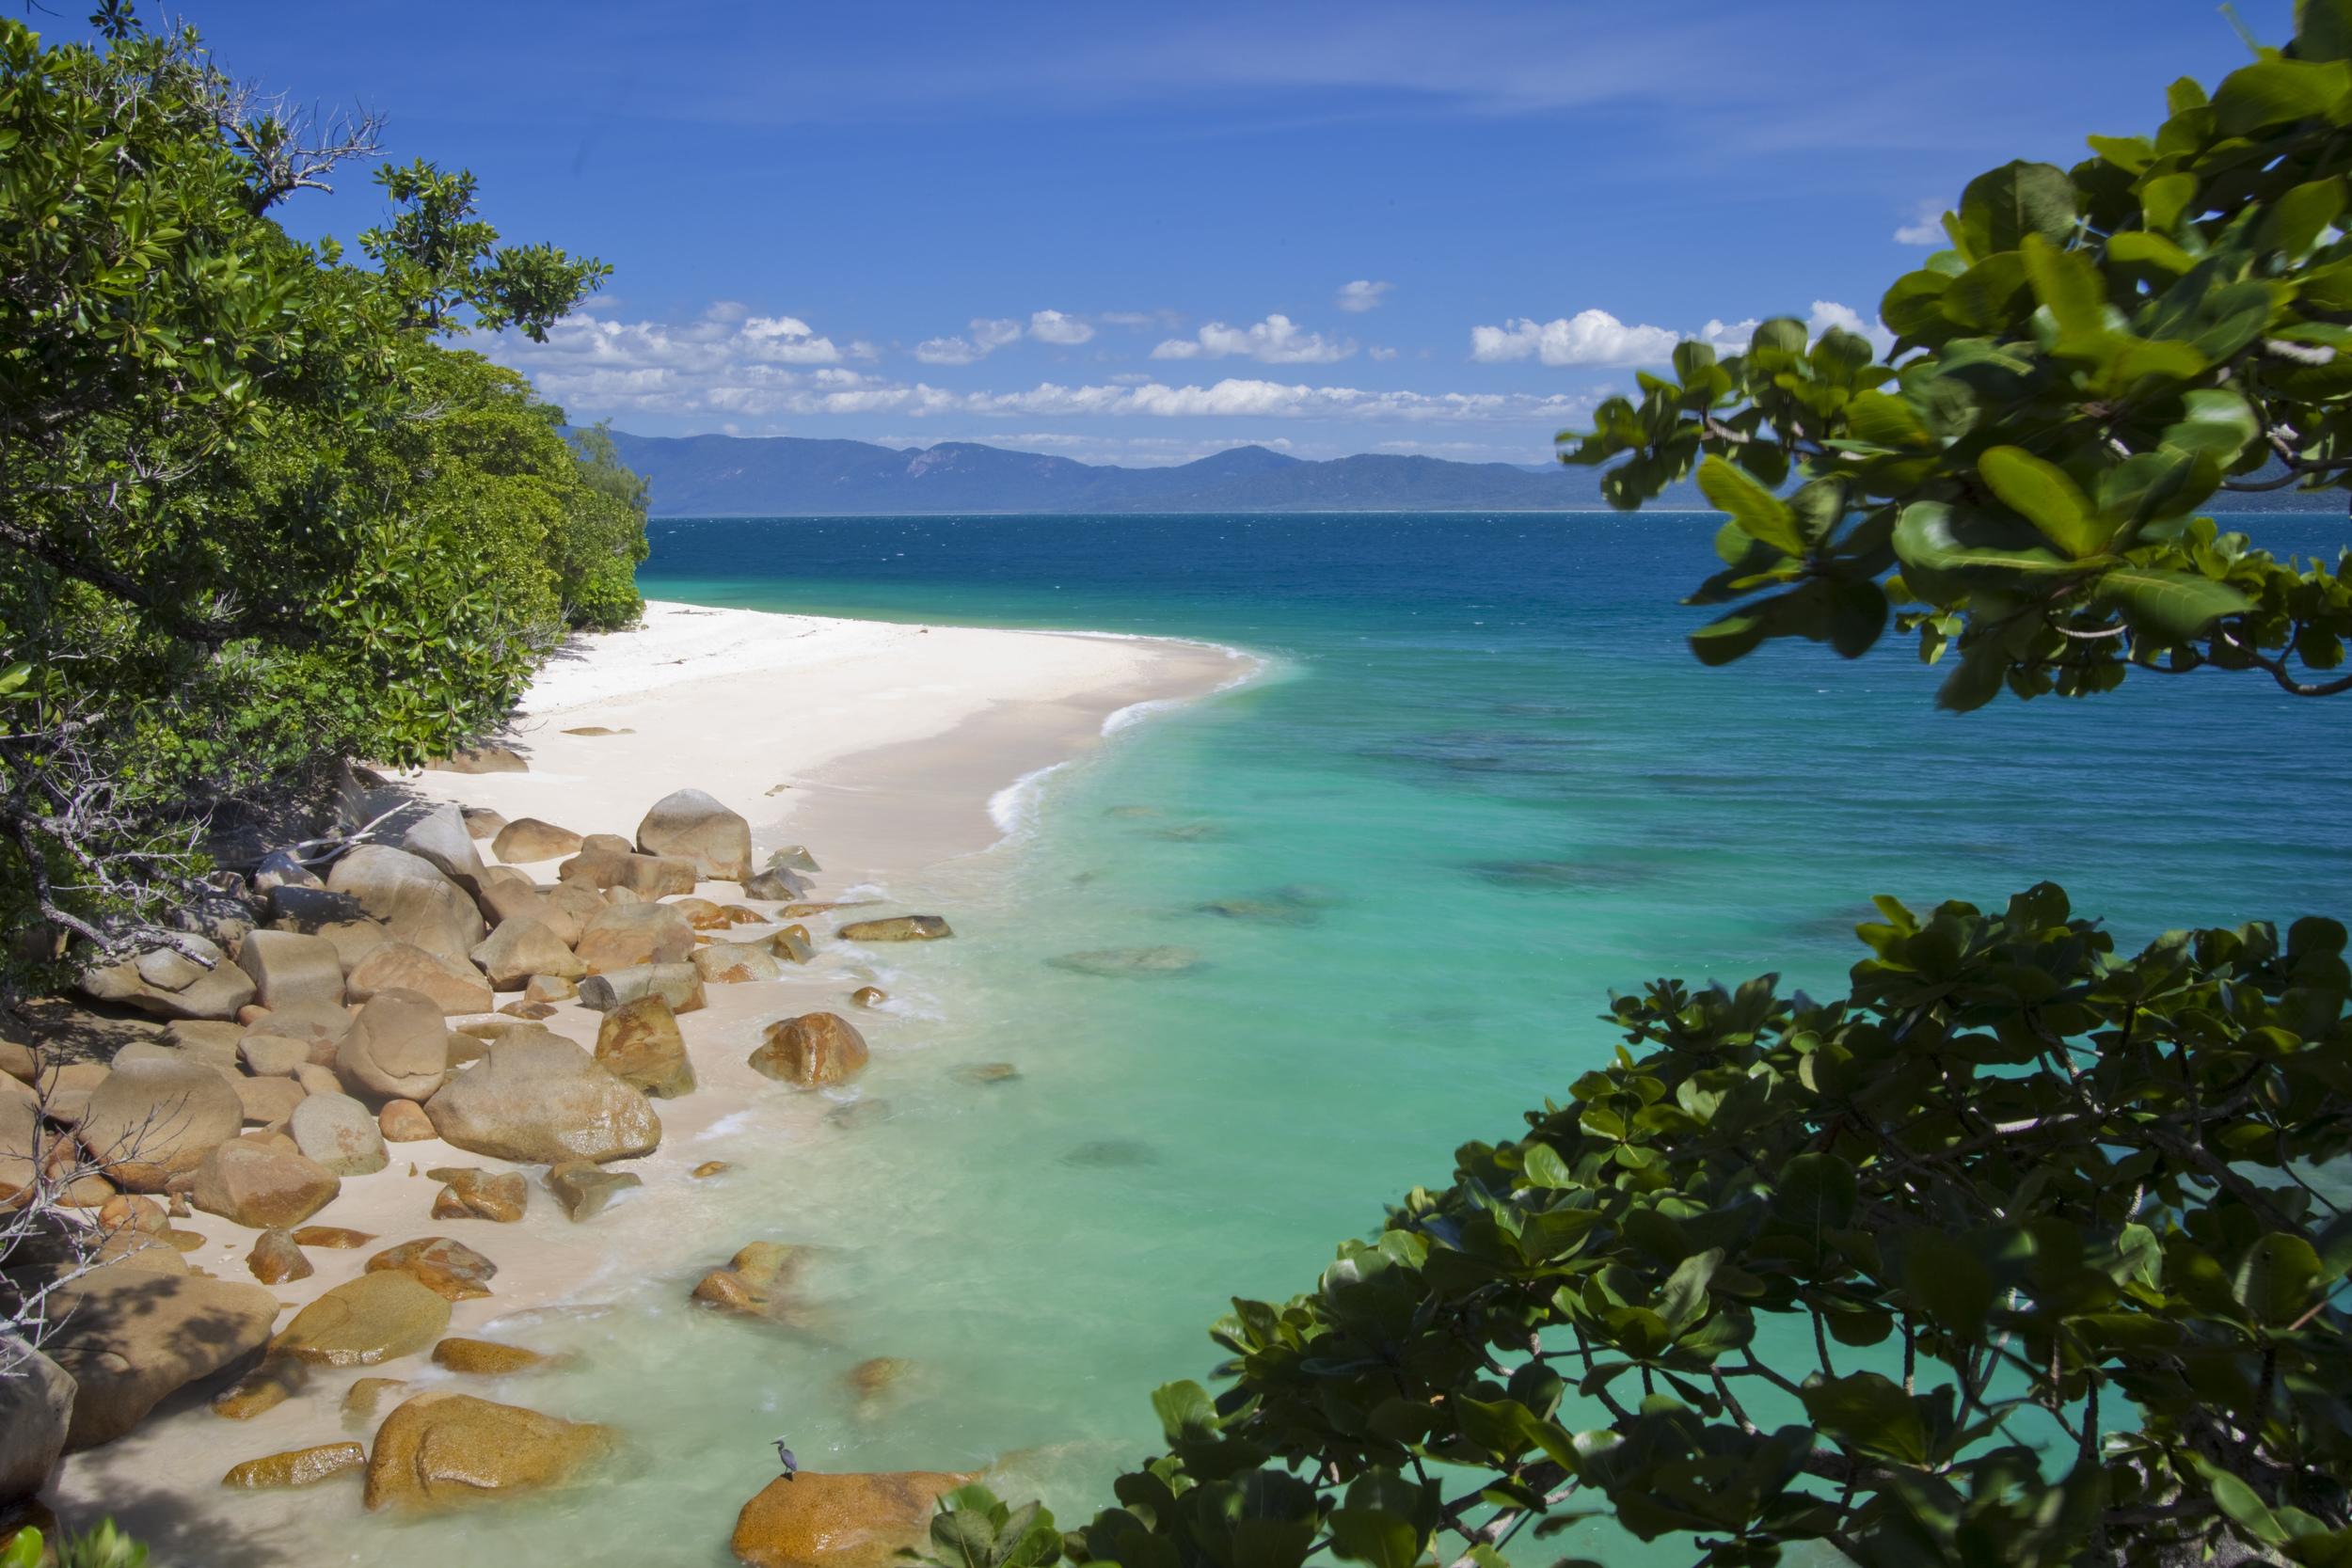 fitzroy-island-resort-great-barrier-reef-australia-hotel-accommodation (4).jpg